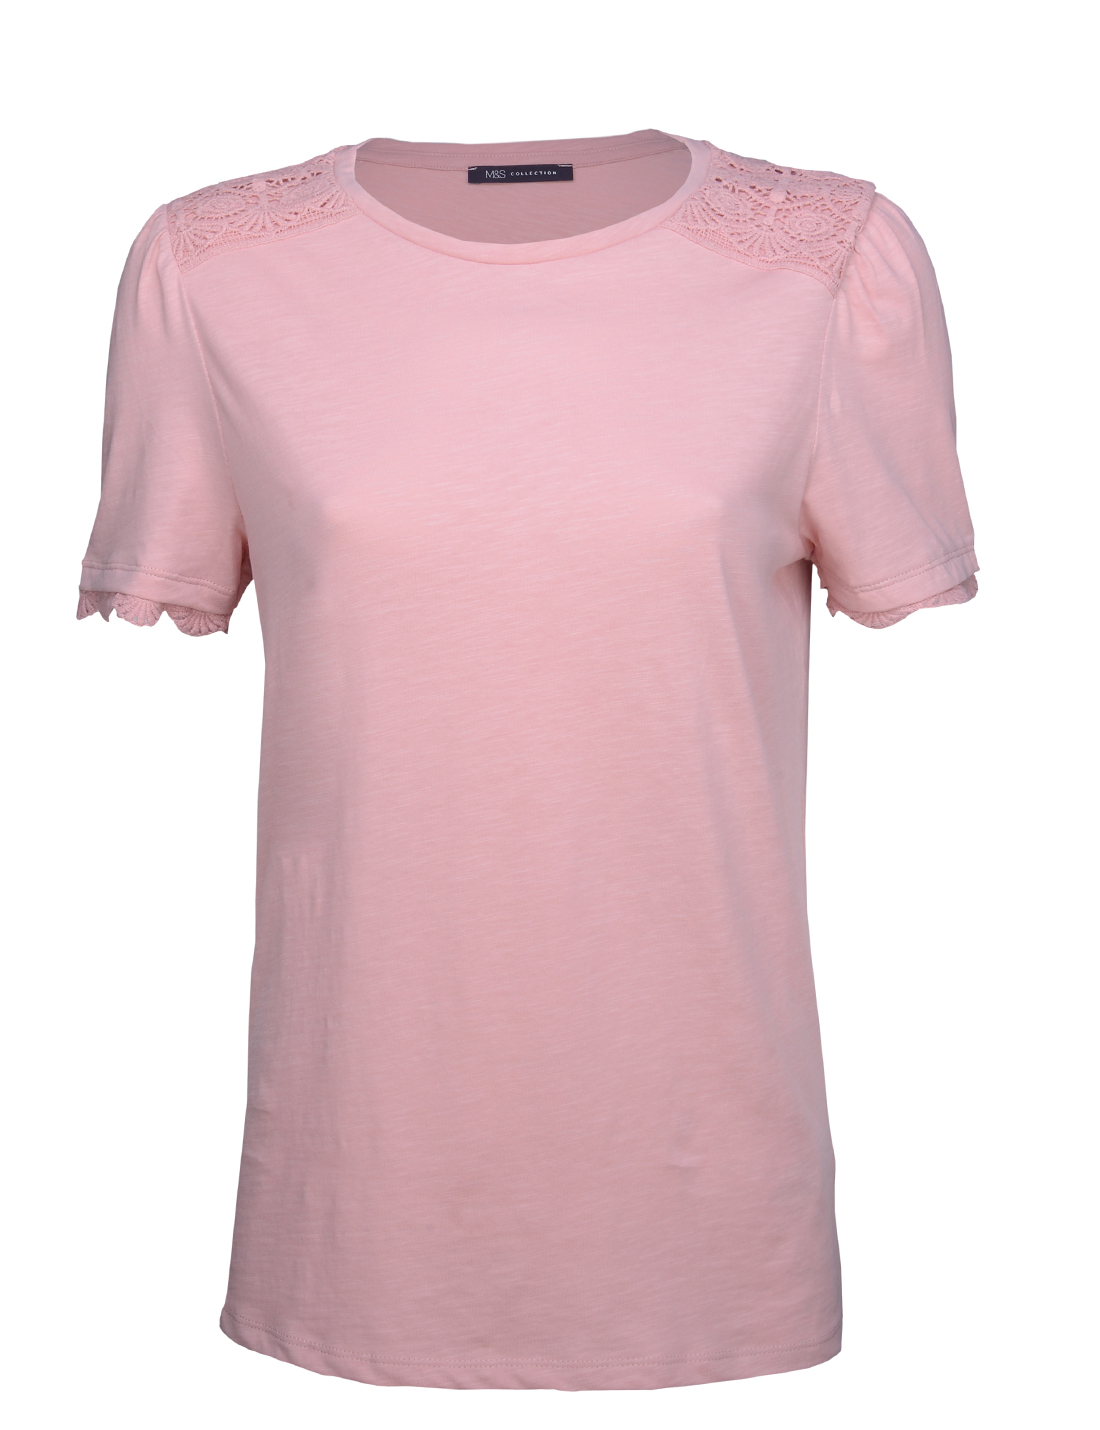 Dantel Detaylı Kısa Kollu T-Shirt